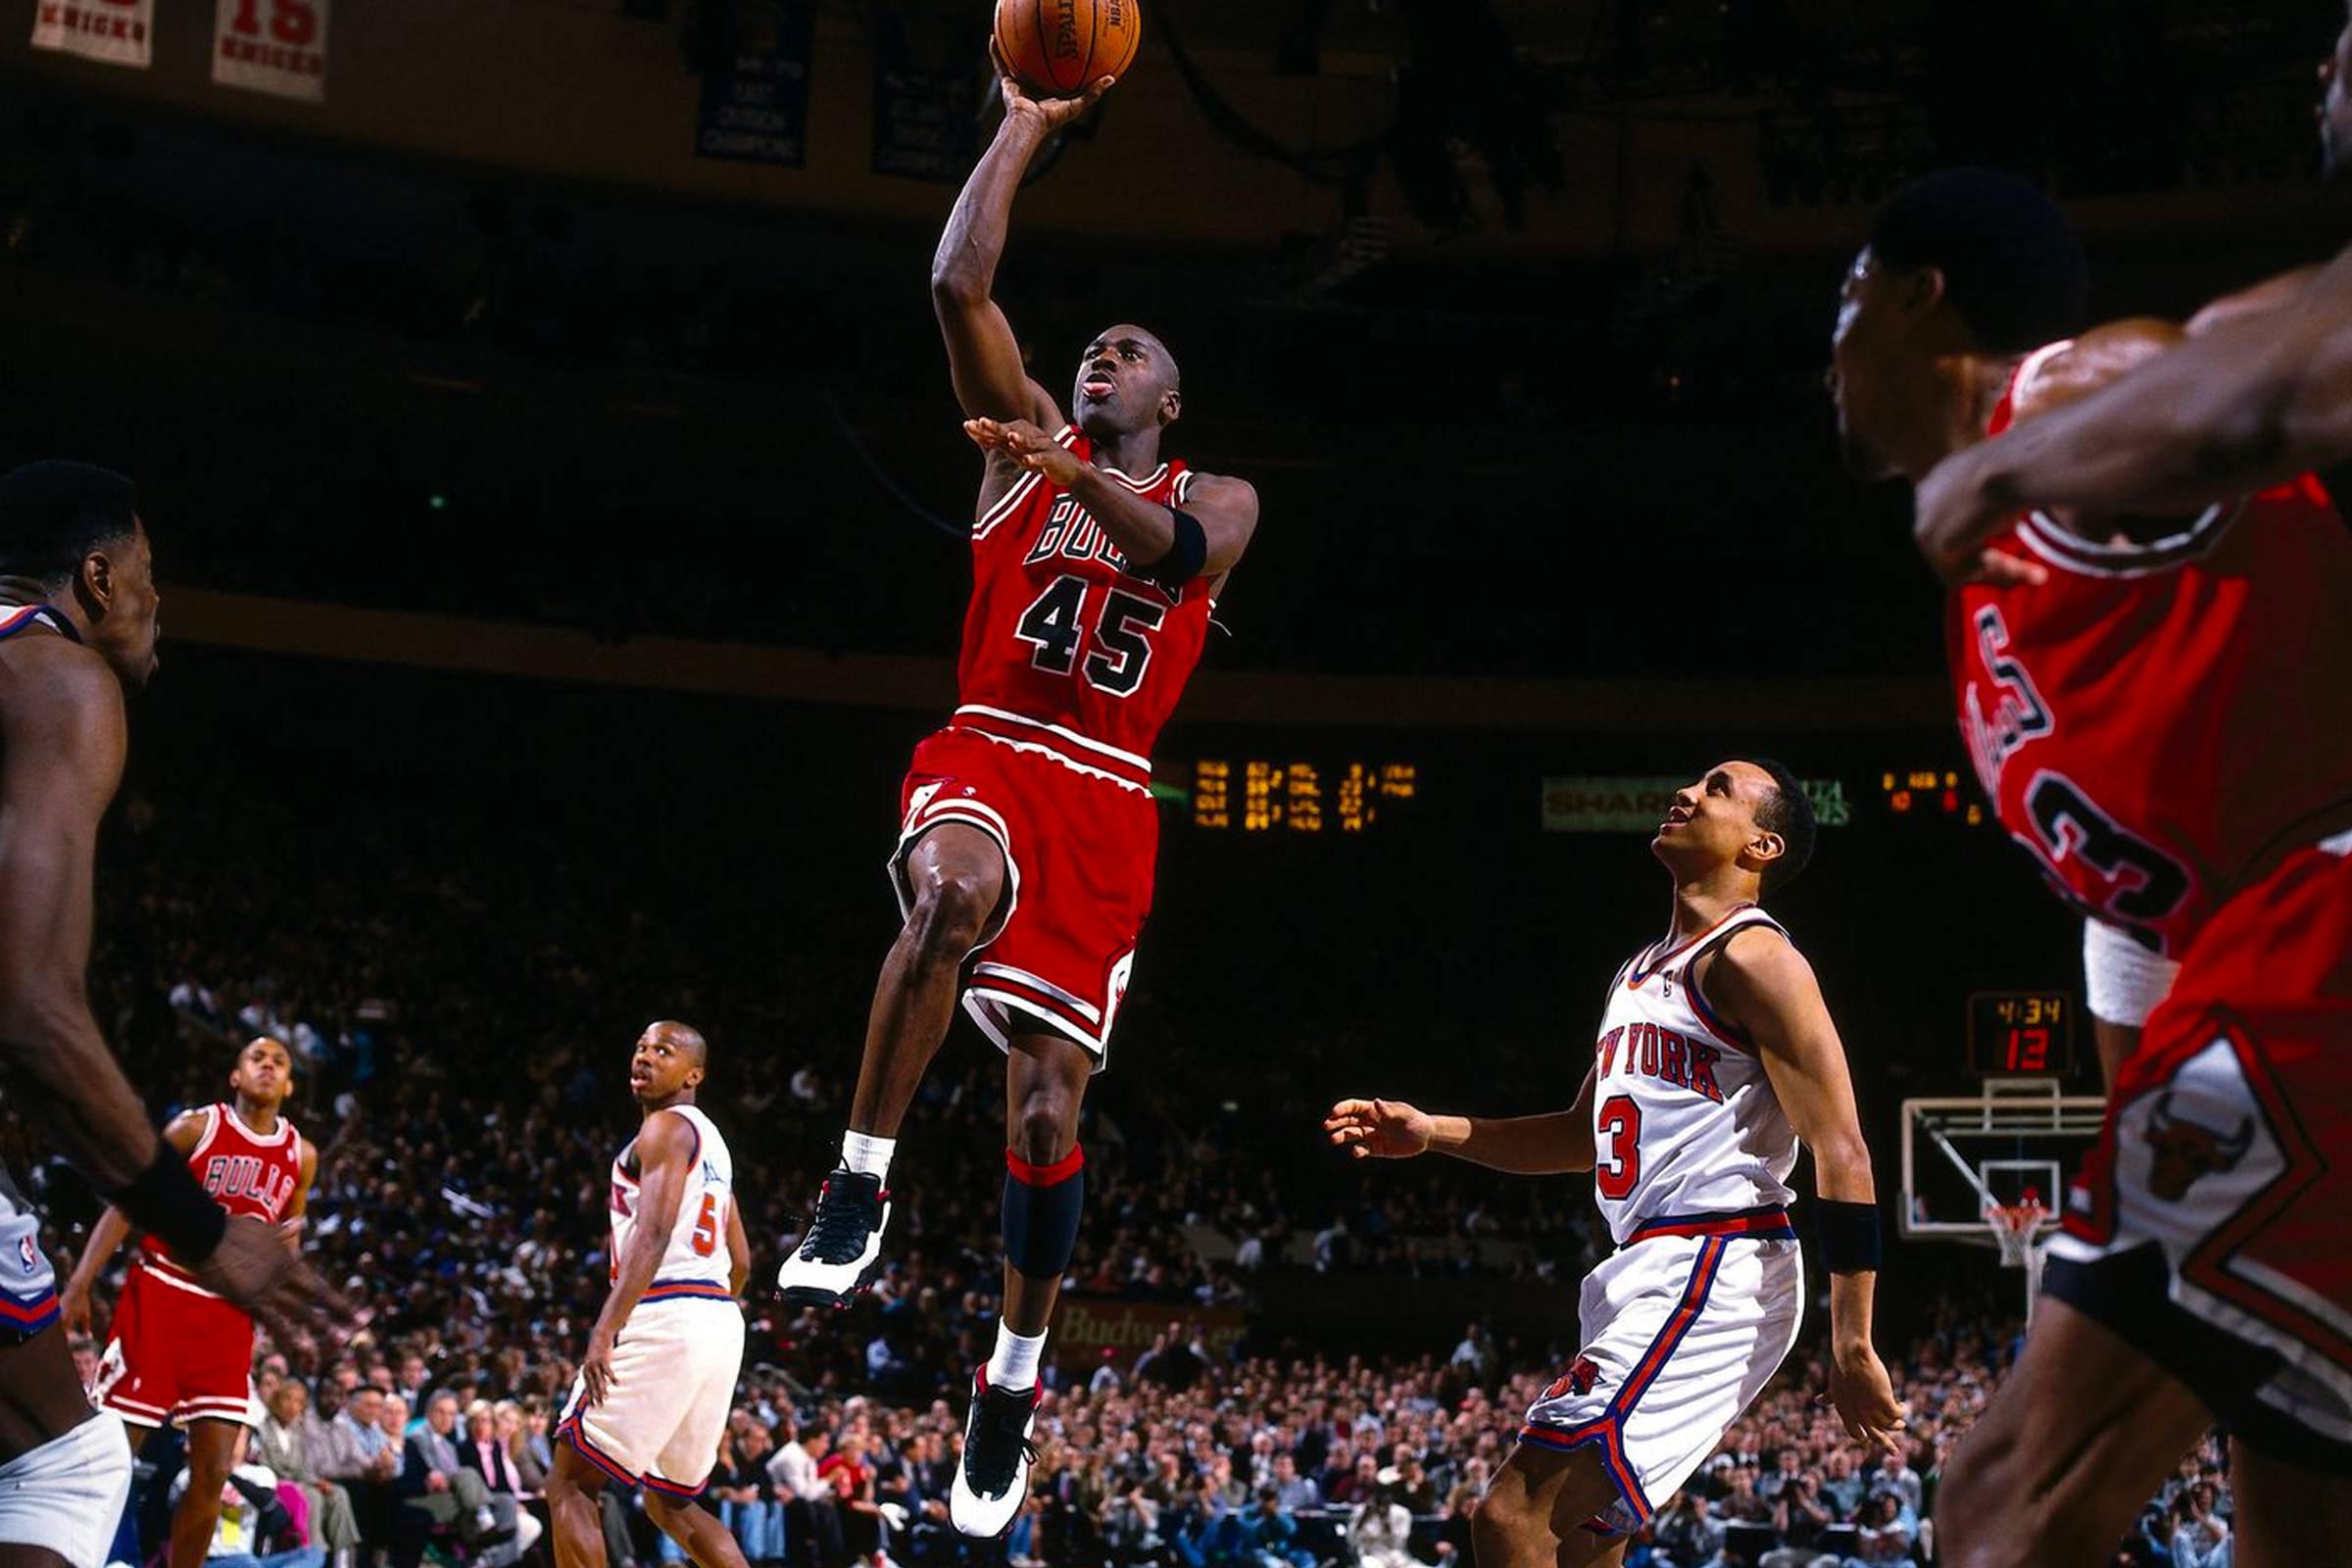 March 28, 1995, Chicago Bulls vs. New York Knicks